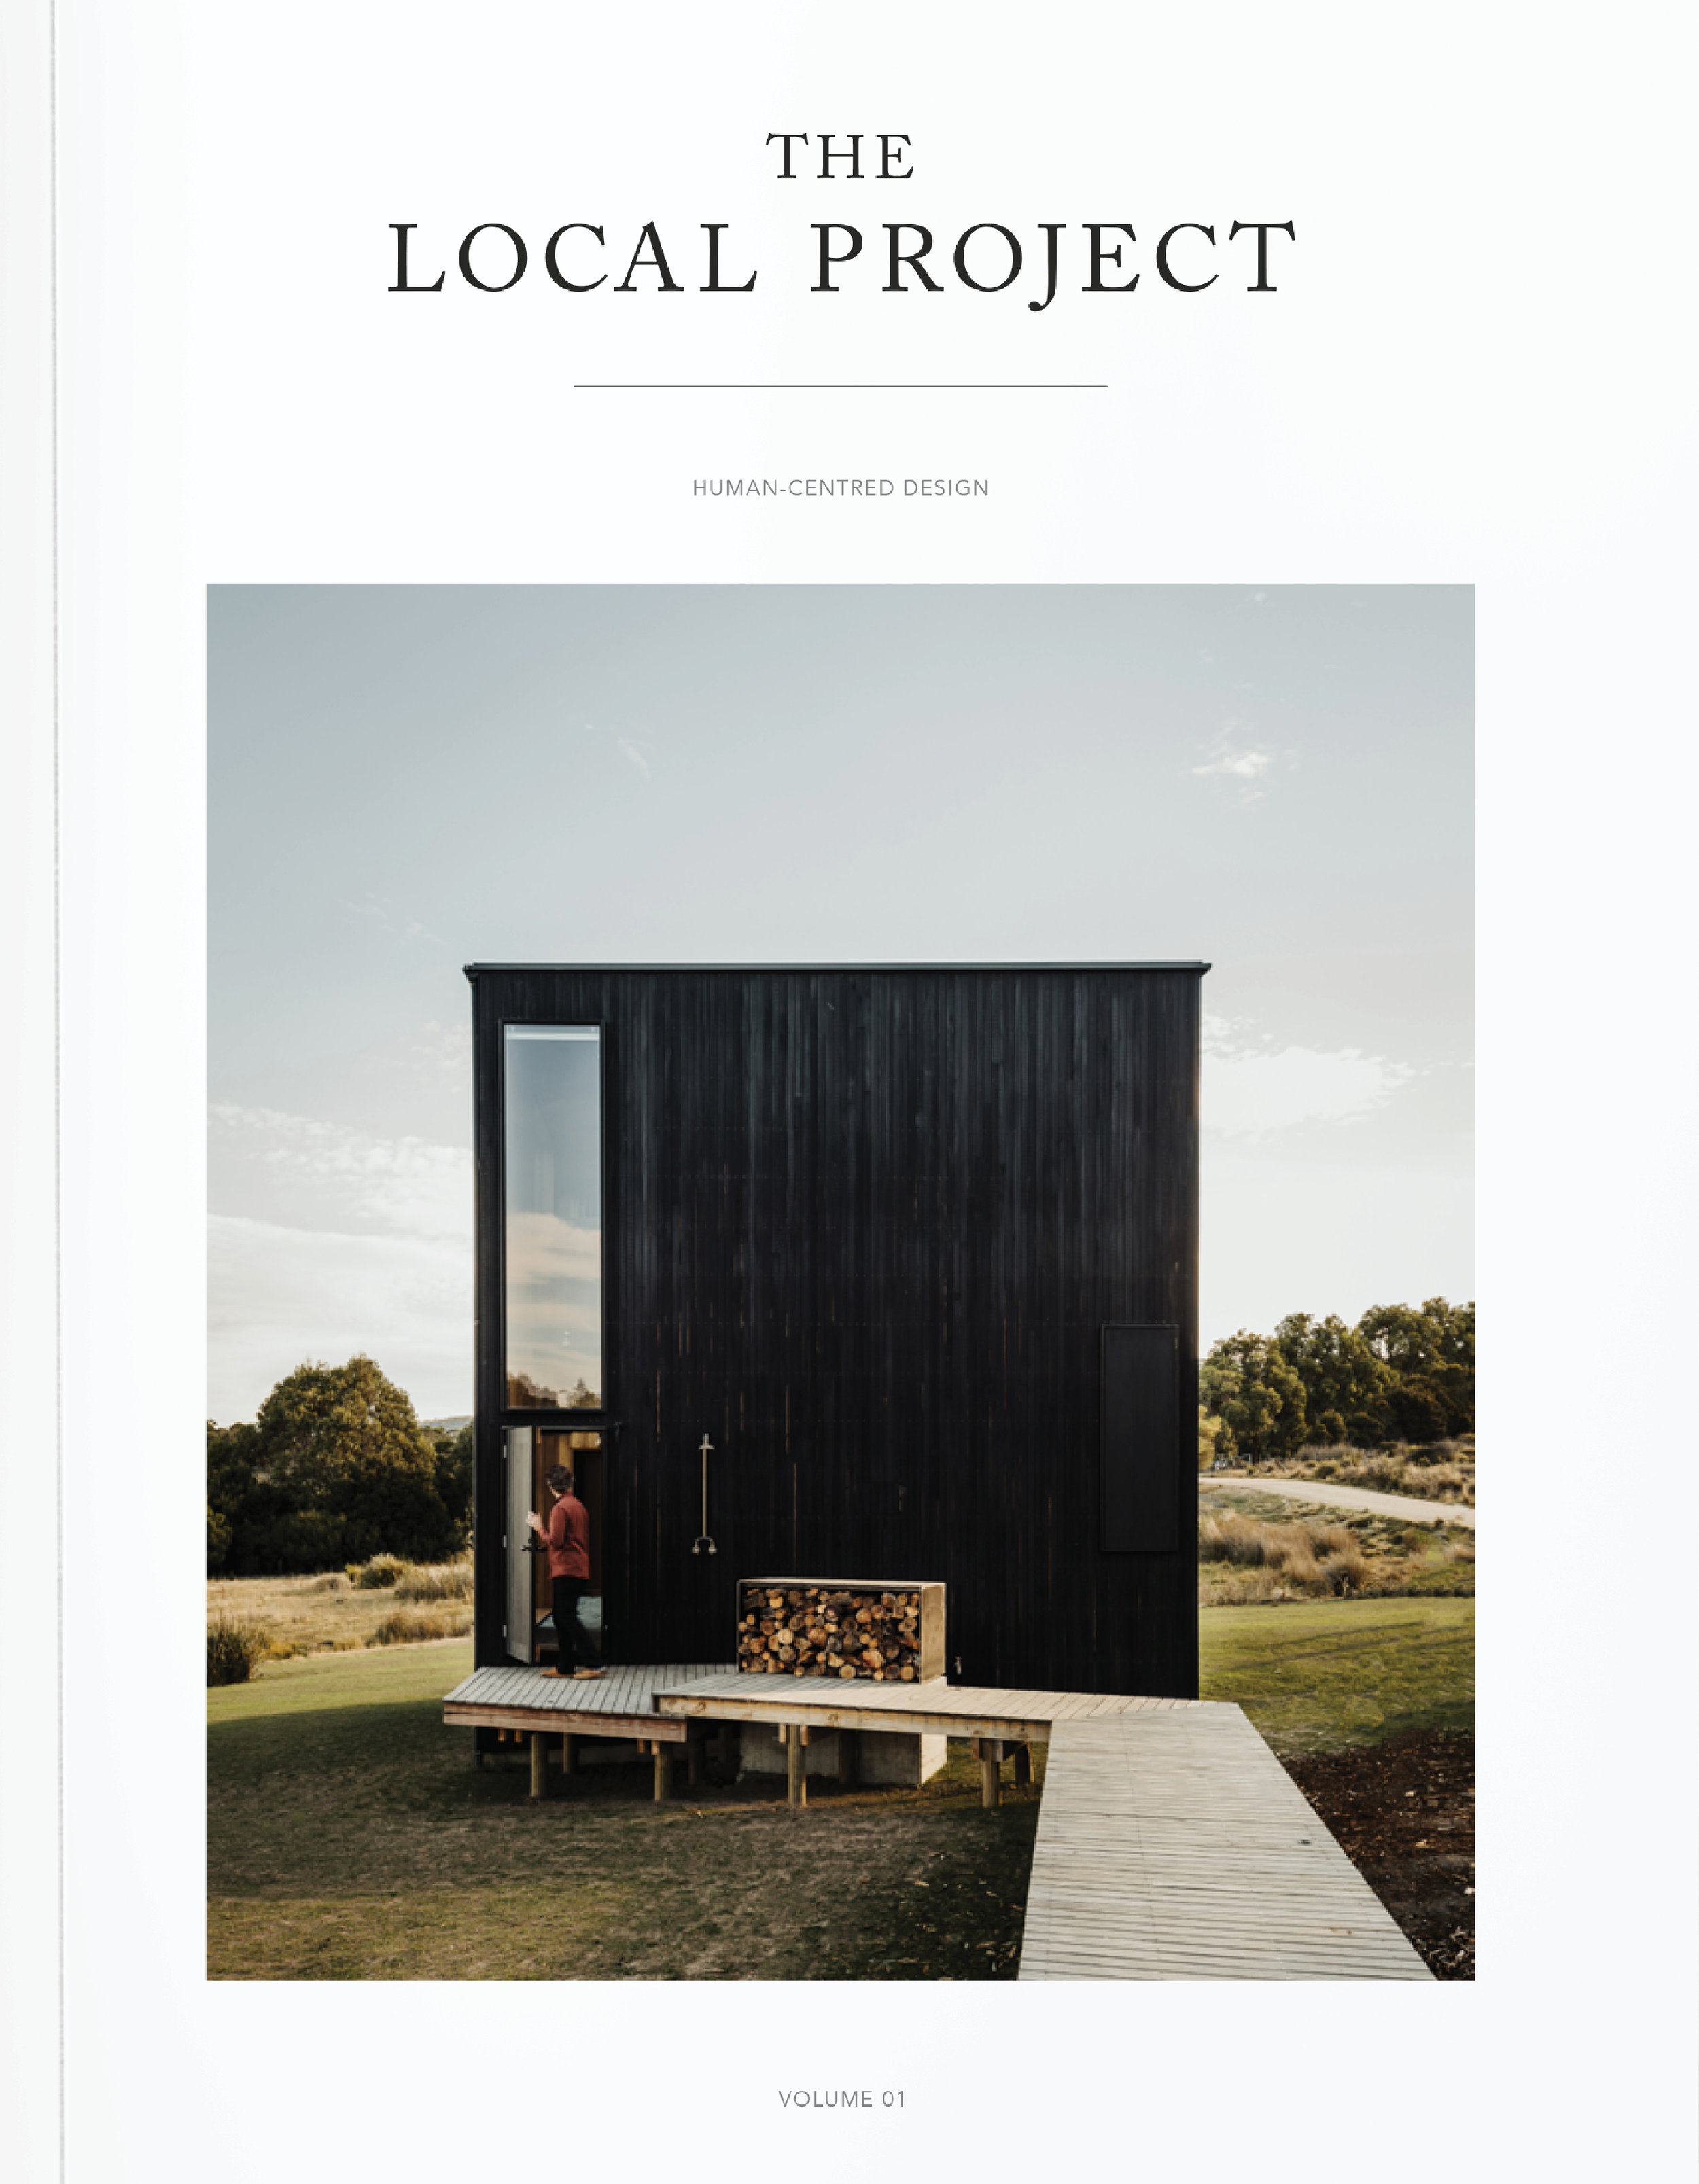 Bower Architecure_TLP_MagPromo_IG Post_no border.jpg